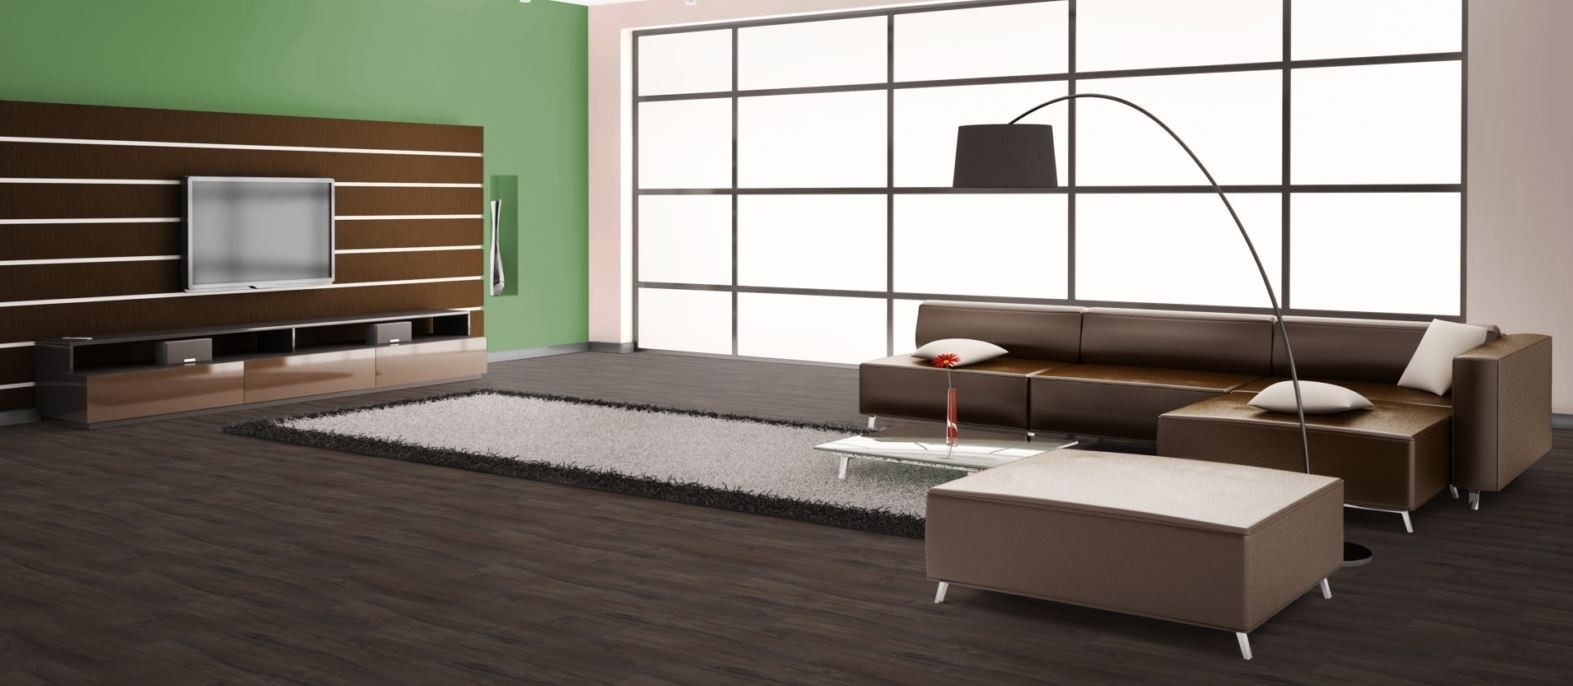 klick vinylboden project eiche schlamm ns 0 5 mm nk 33 42 format 1210 x 190 x 5 mm klick. Black Bedroom Furniture Sets. Home Design Ideas